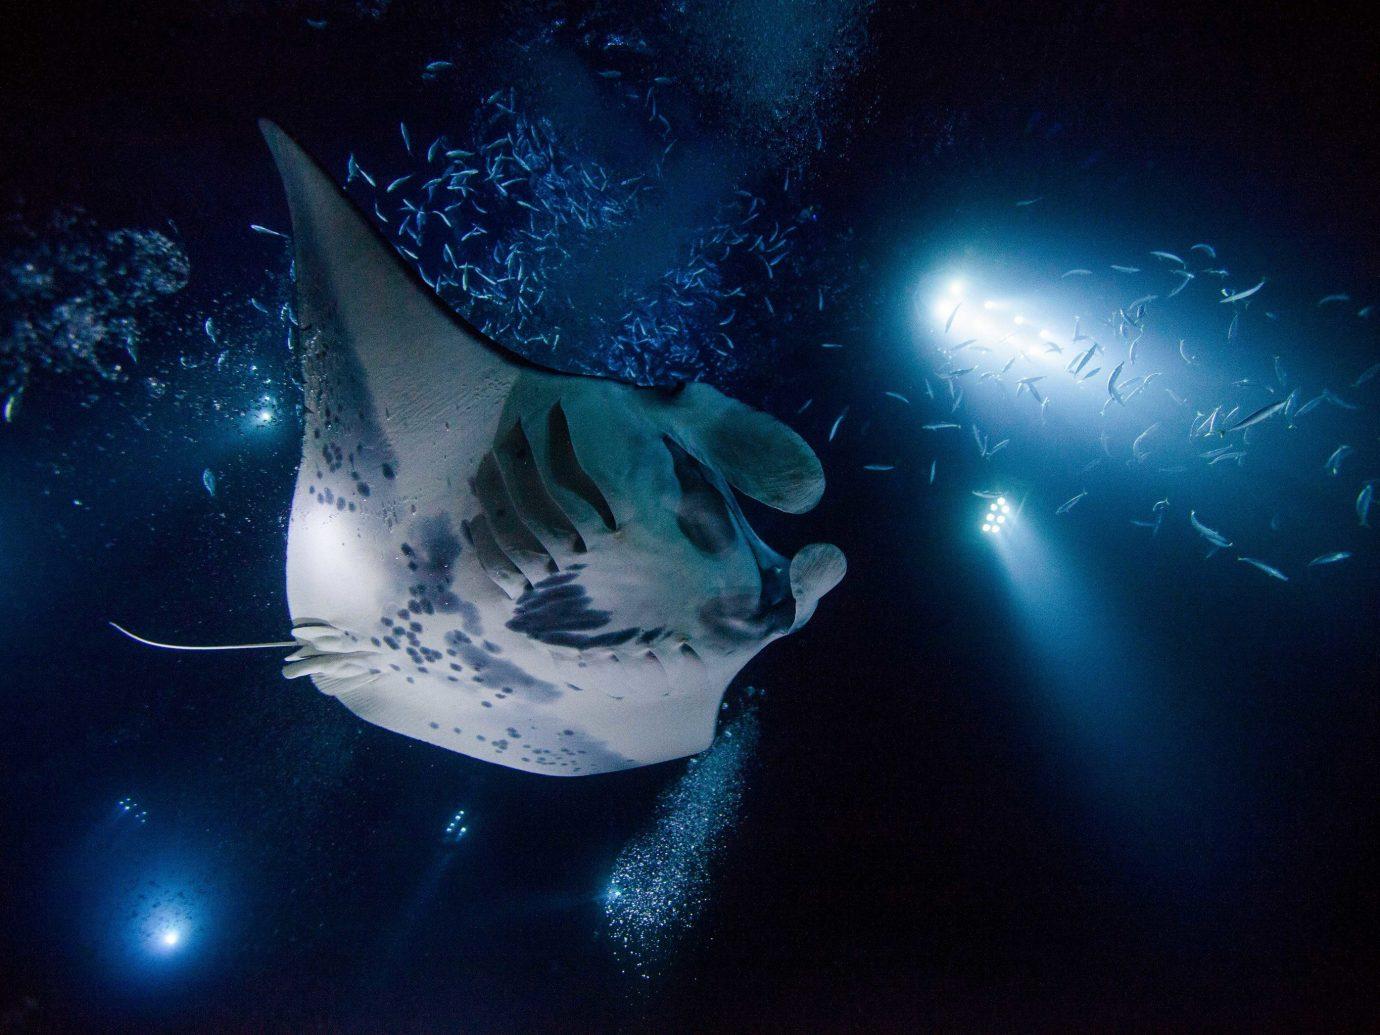 Kona Coast Trip Ideas ray fish animal marine biology rays and skates cartilaginous fish organism stingray manta ray computer wallpaper shark earth tiger shark requiem shark space darkness deep sea fish great white shark dark